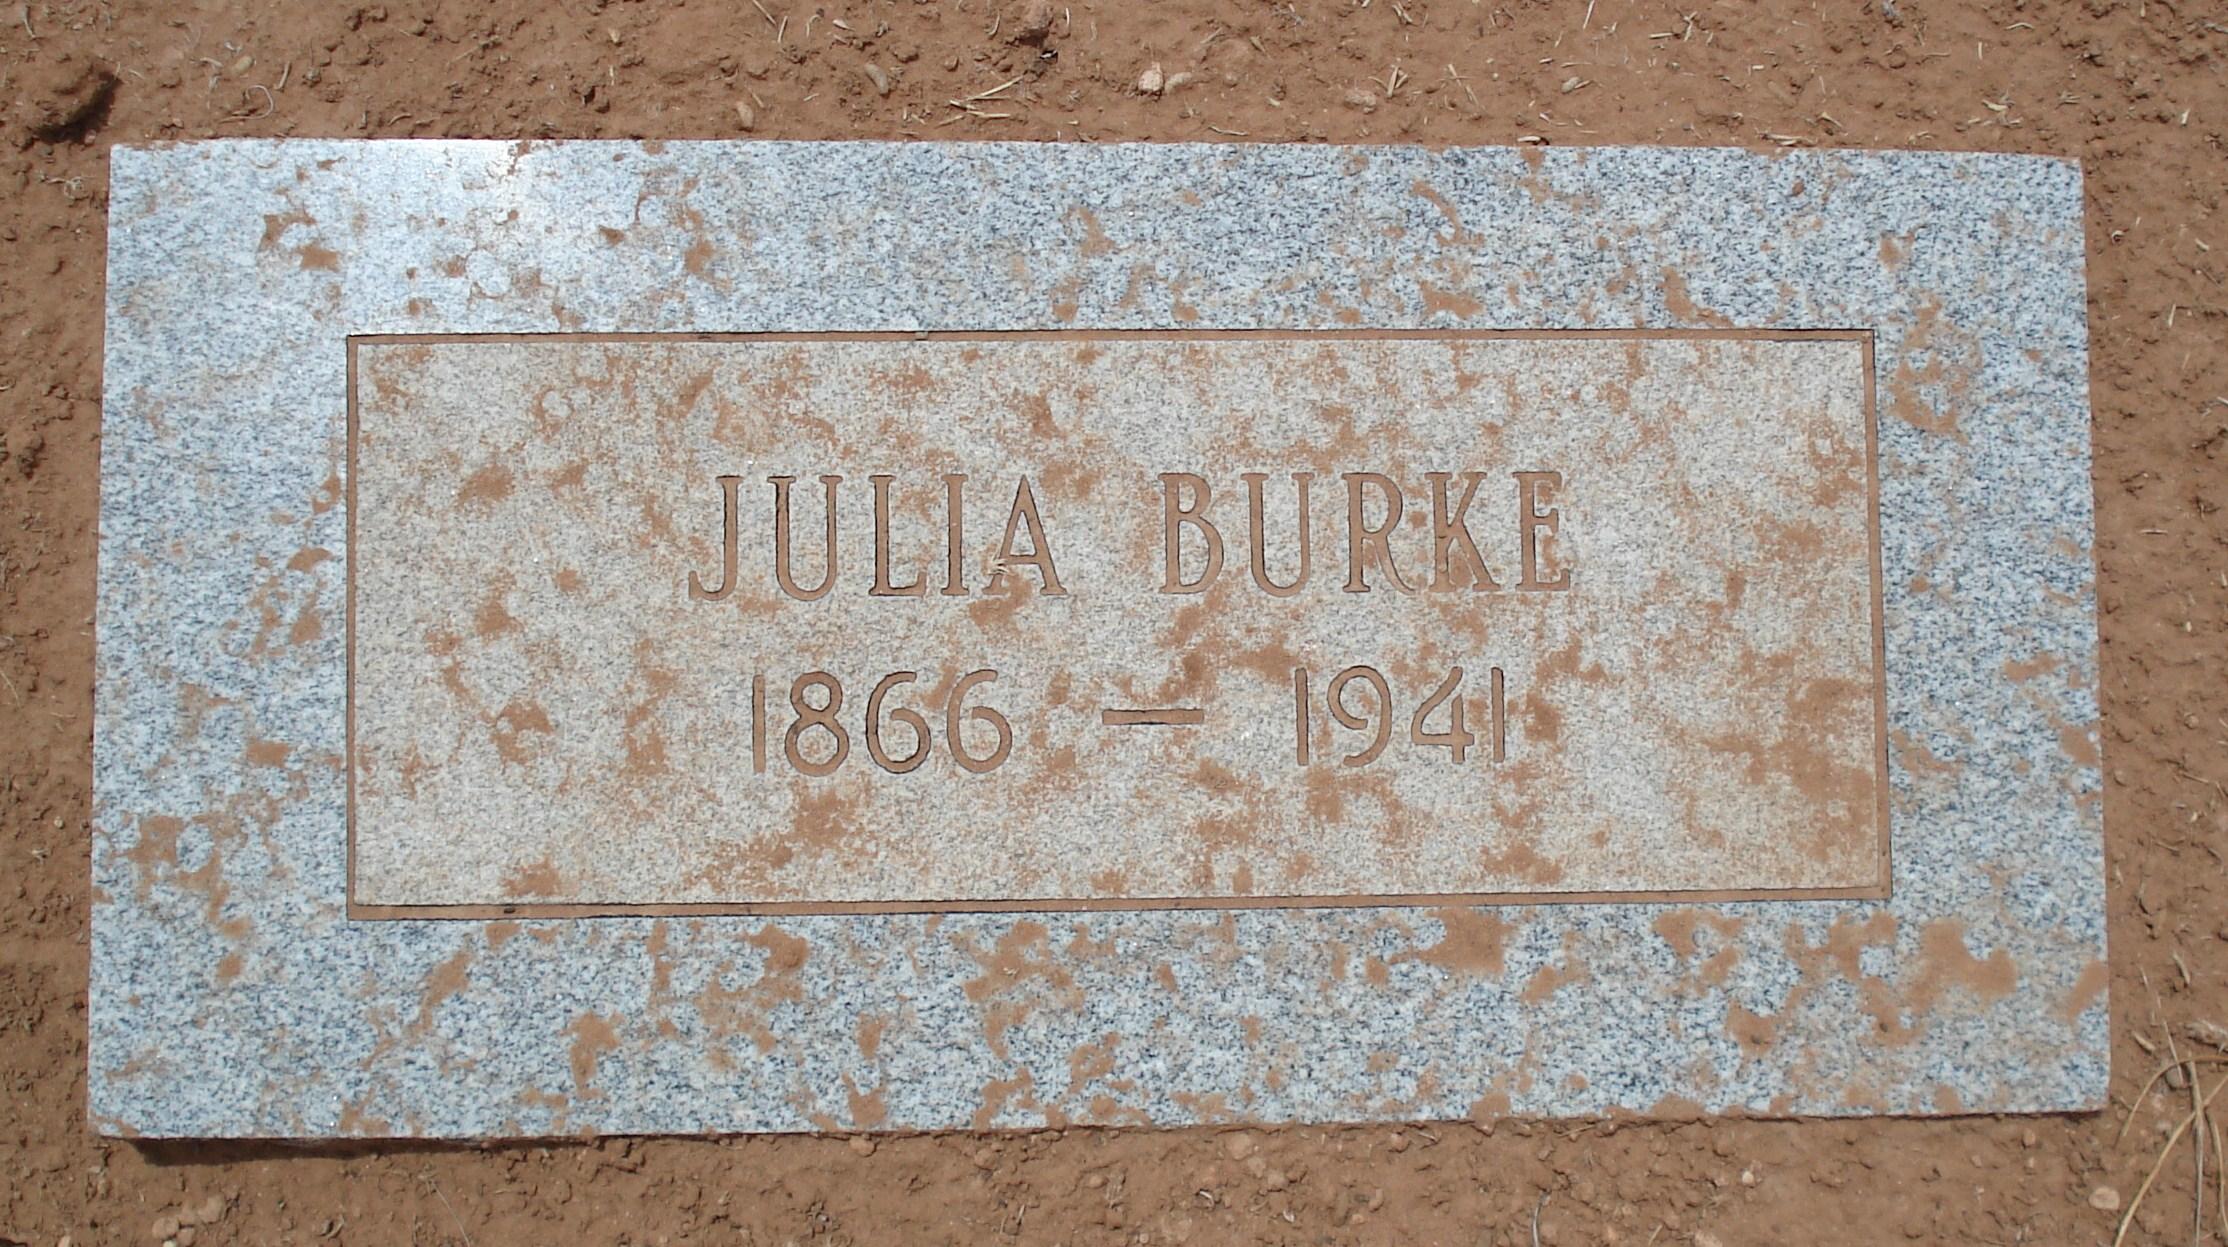 Julia Burke